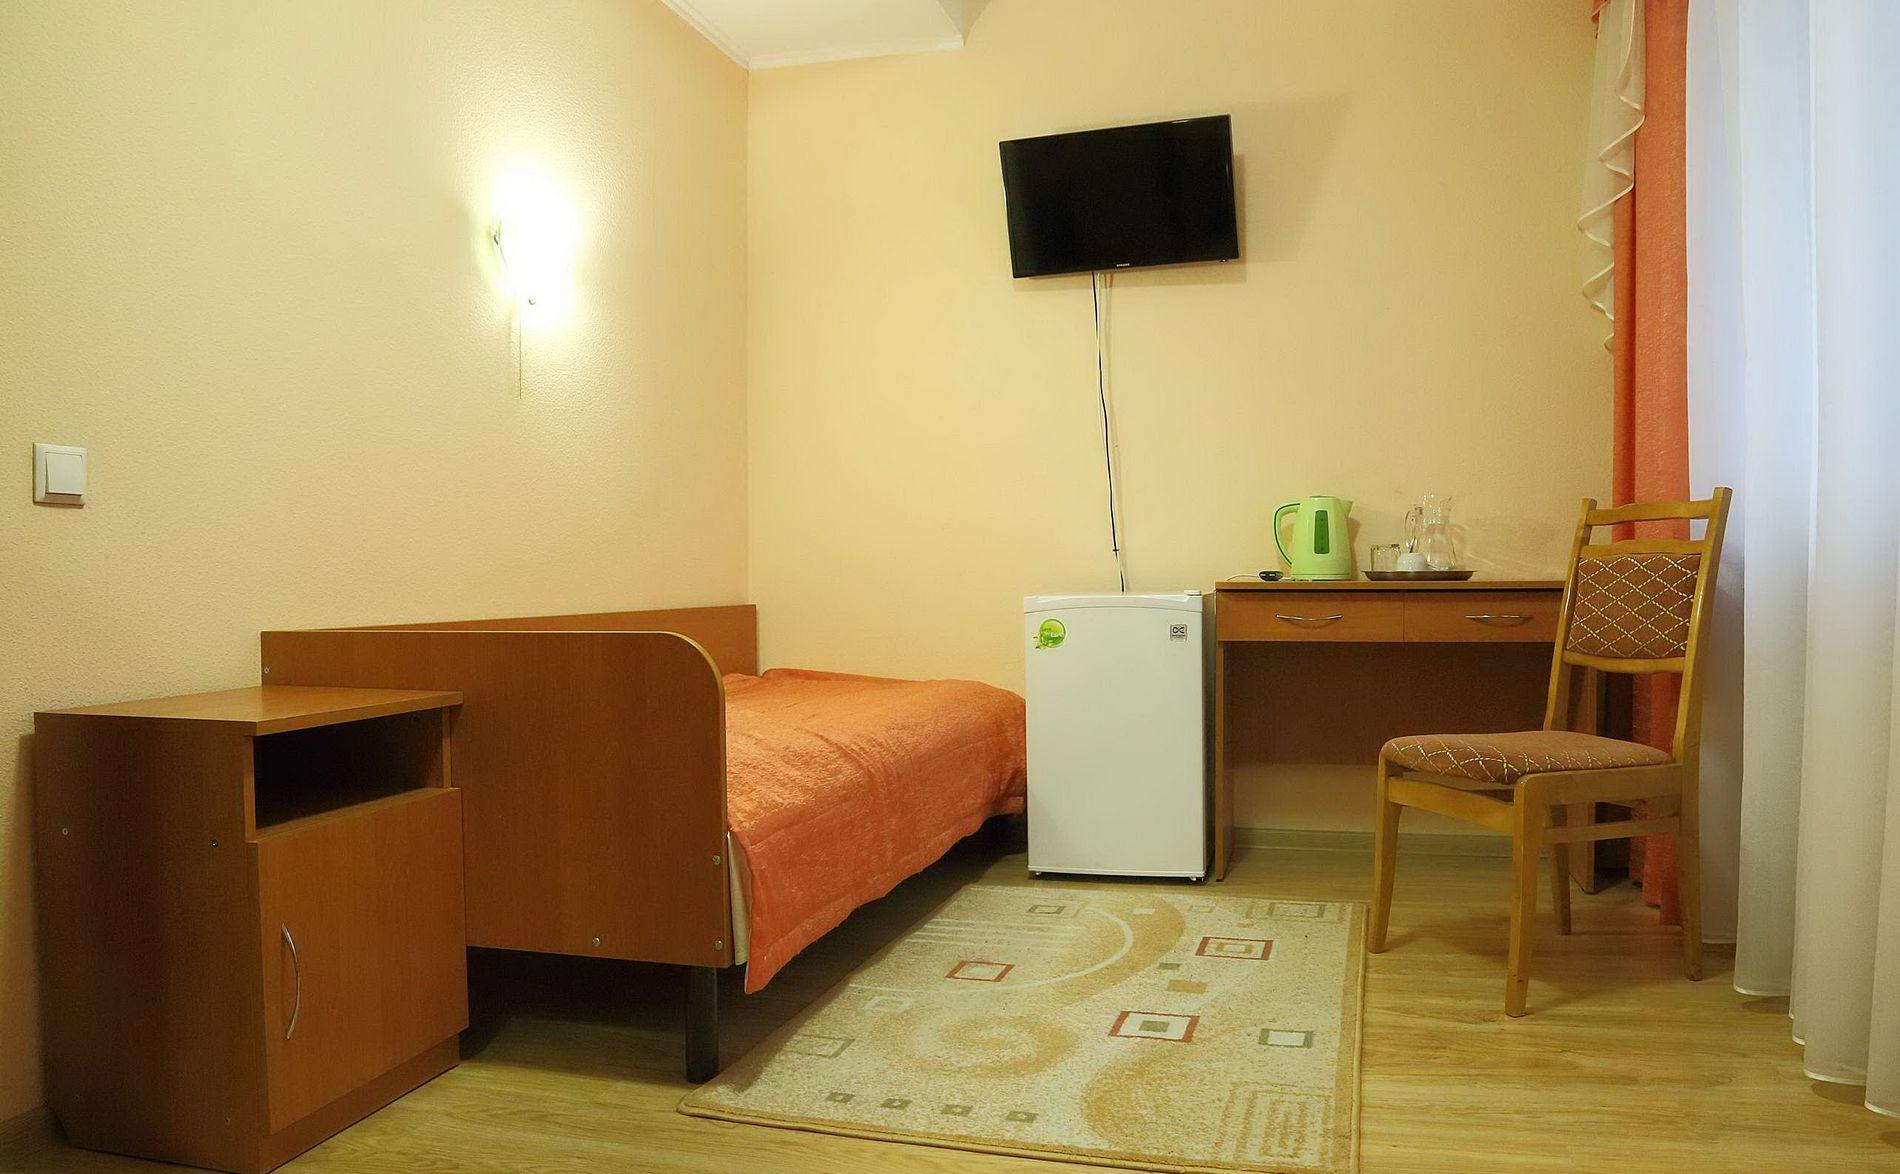 Building 1 - Single room